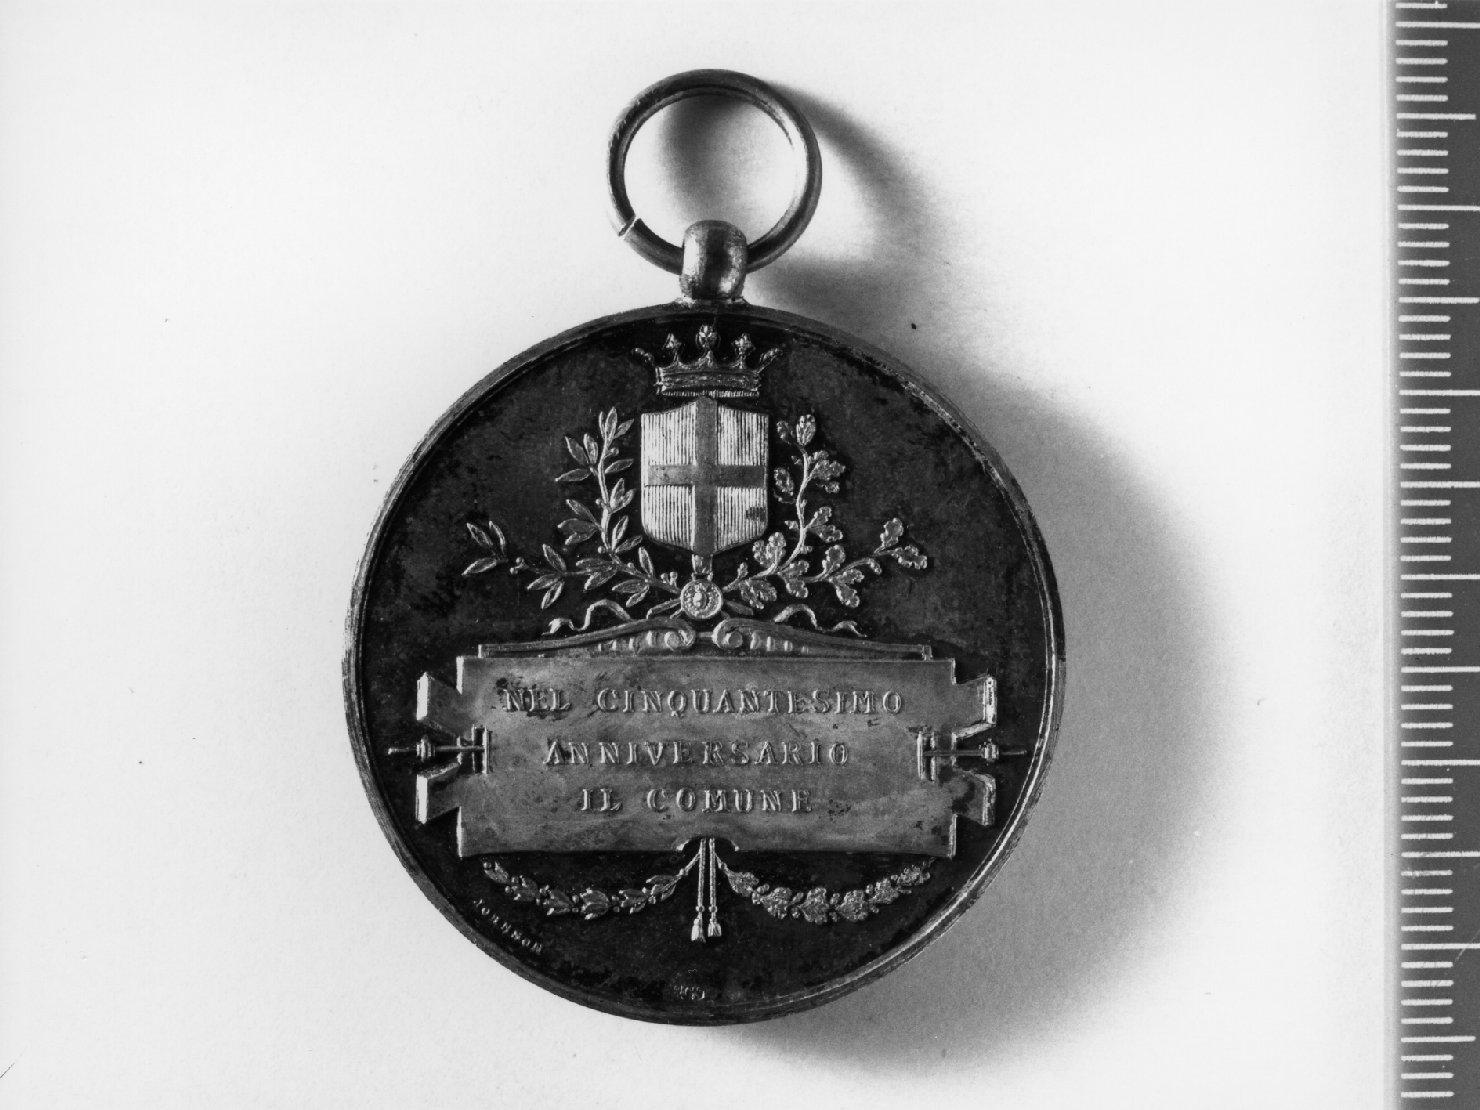 medaglia di Johnson Stefano (sec. XIX)